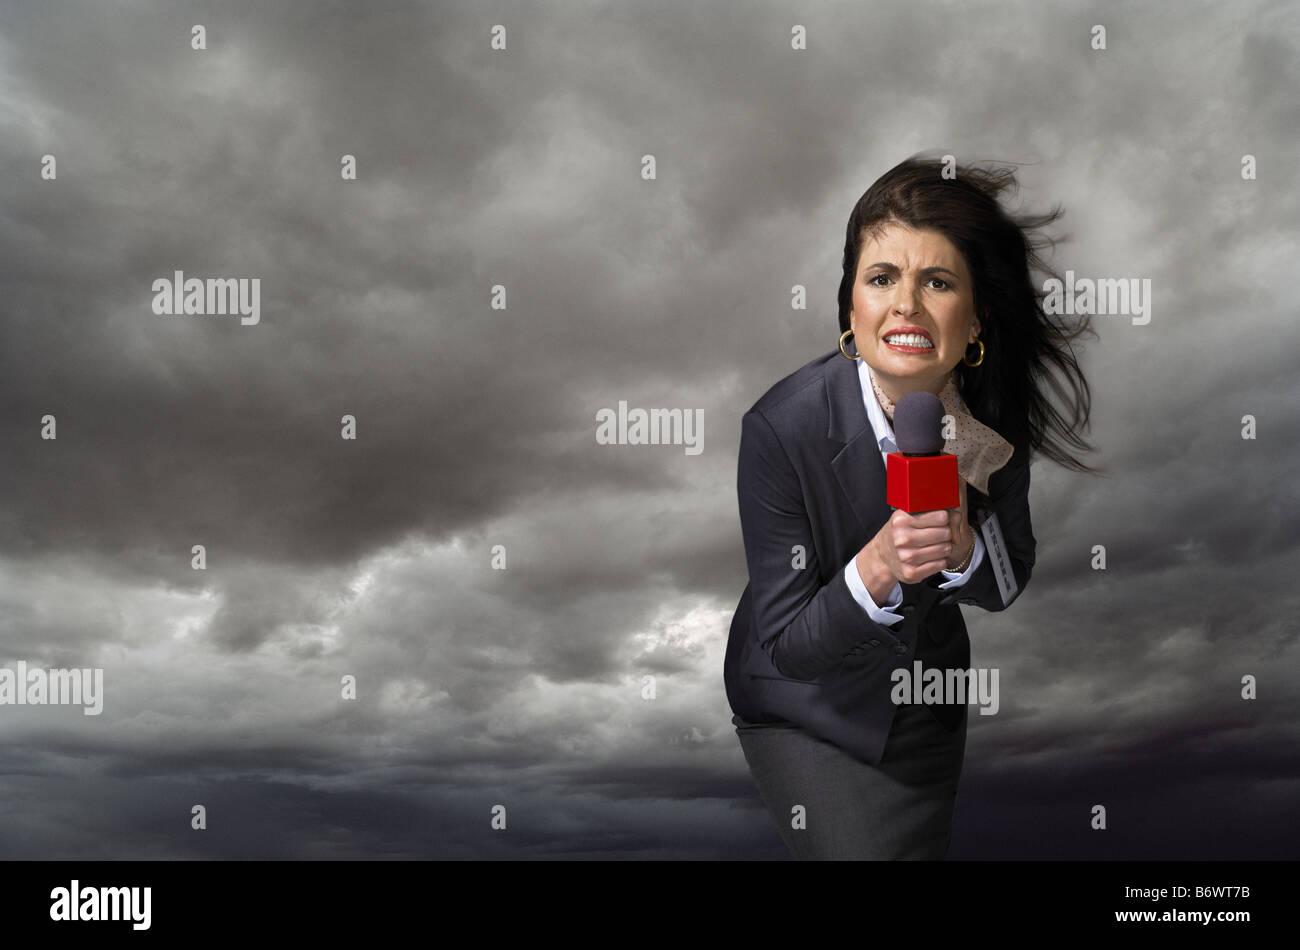 News presenter in storm - Stock Image